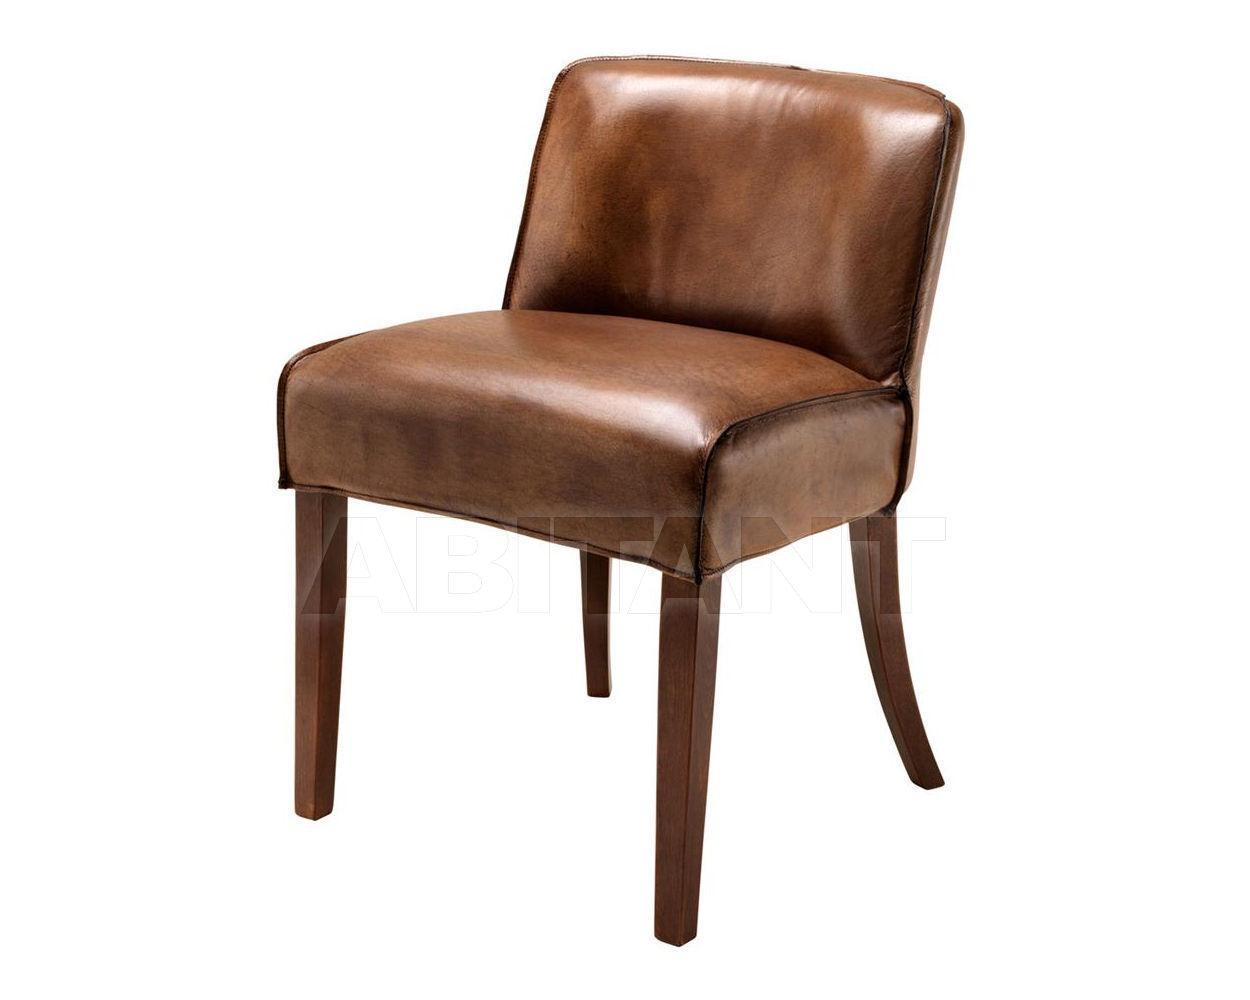 Купить Стул Barnes Eichholtz  Chairs And Sofa's 107009